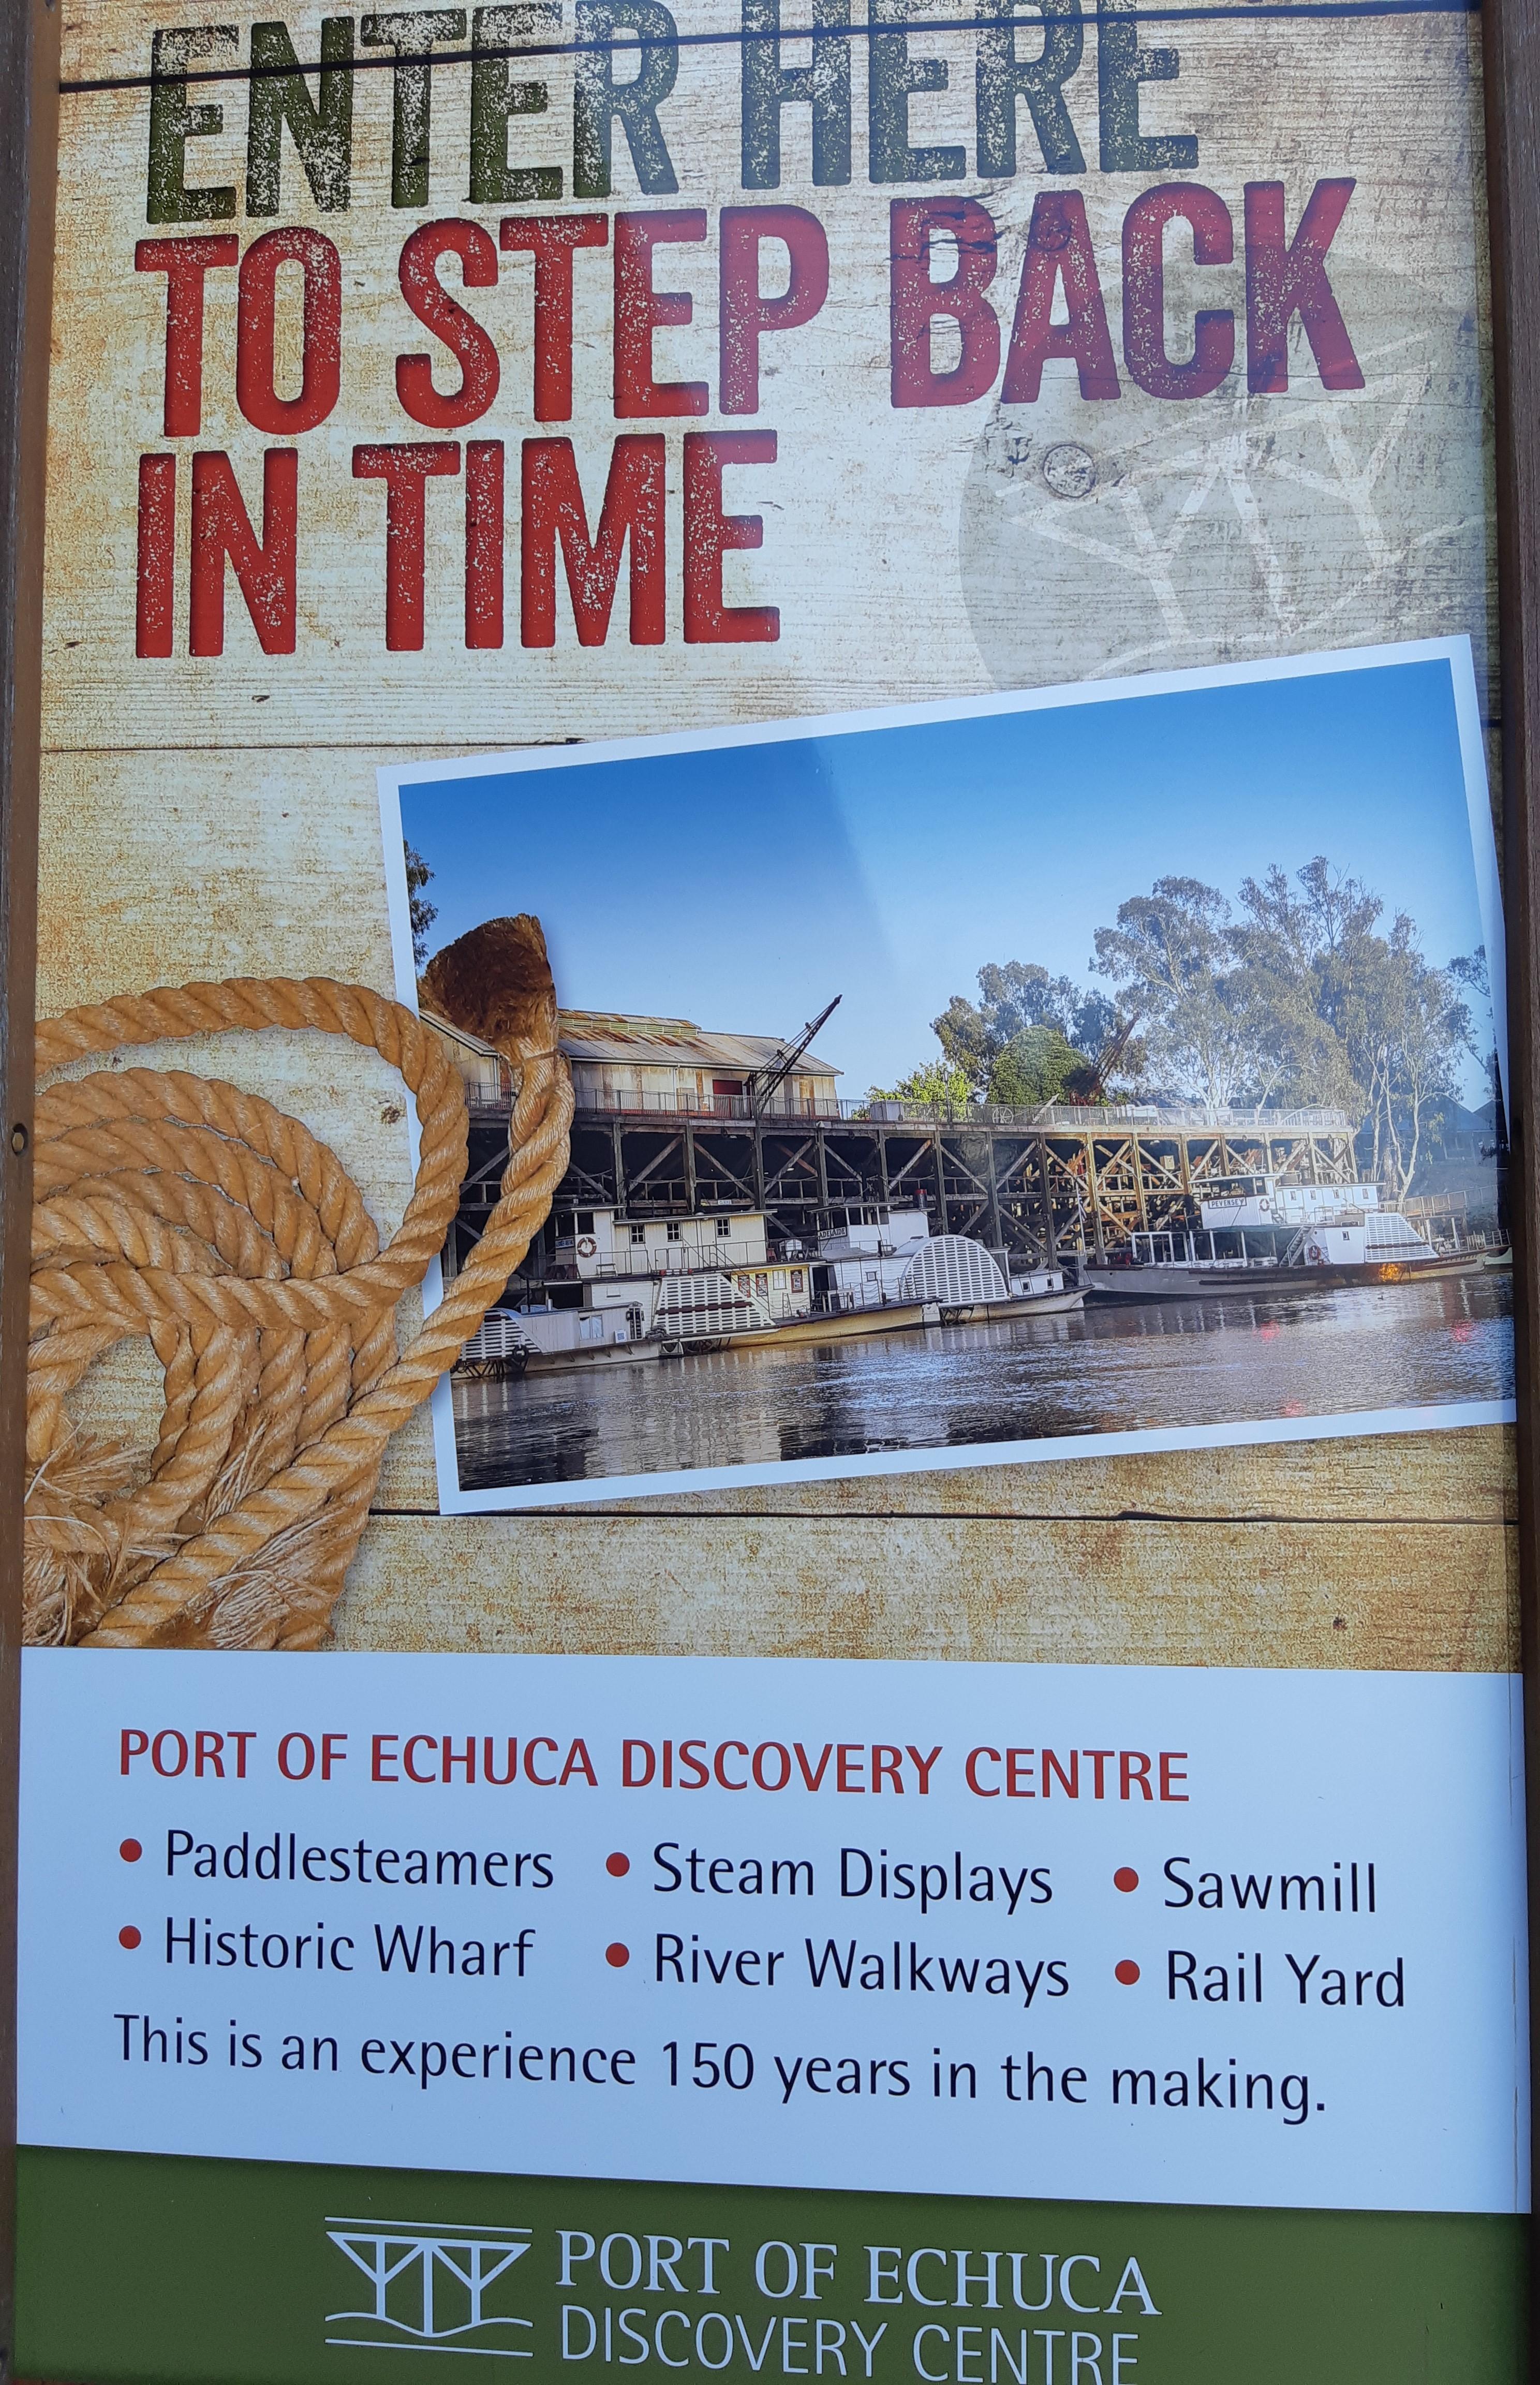 Port of Echuca Discovery Centre